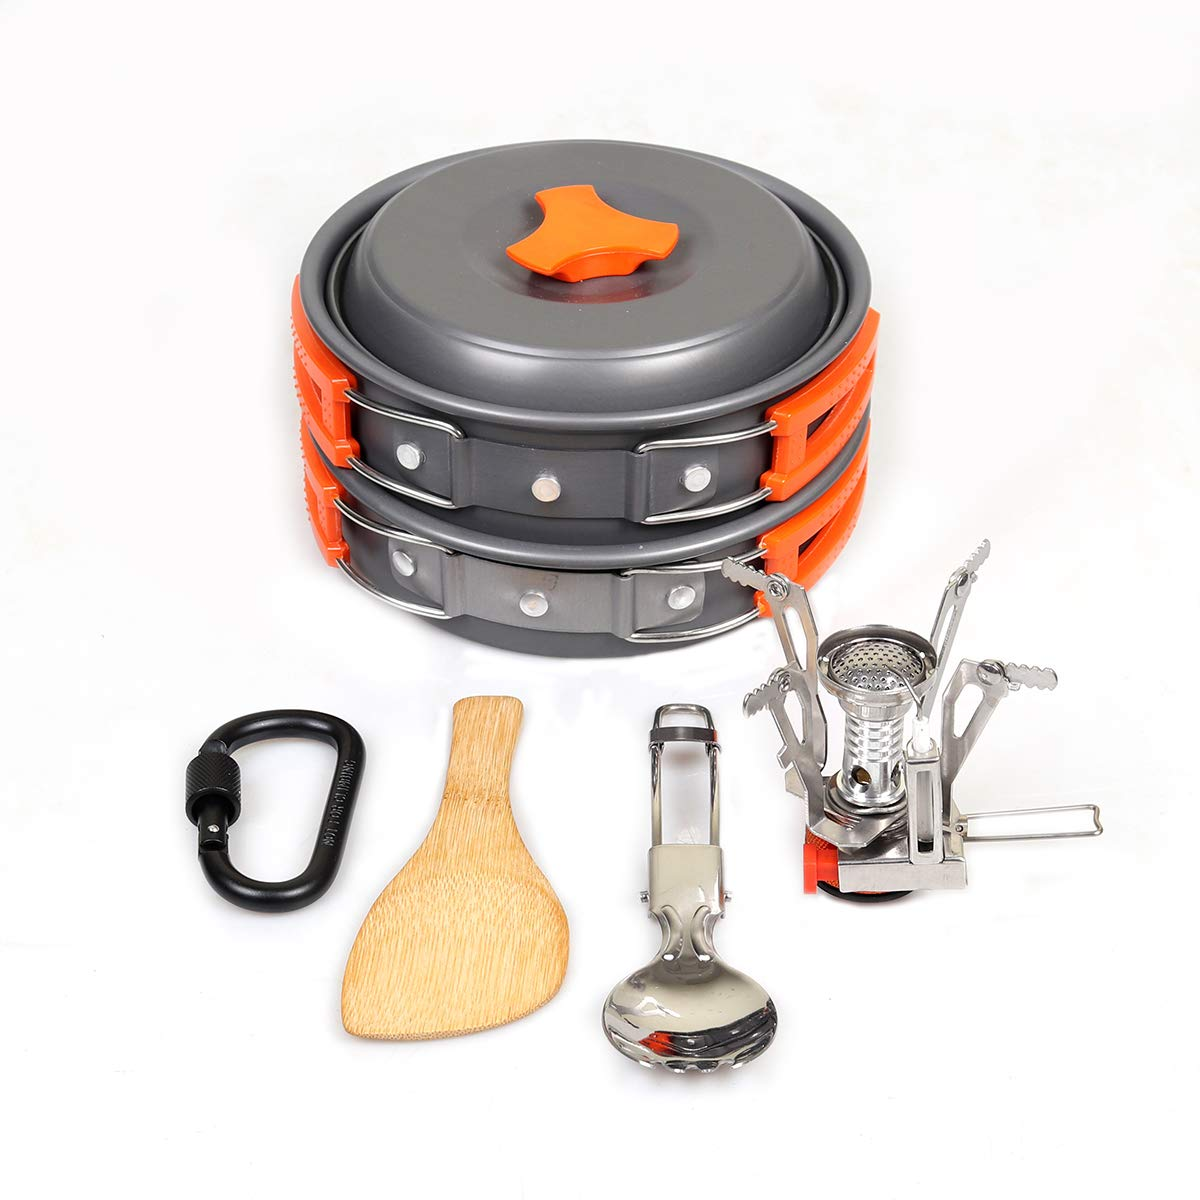 Goetland Camping Cookware Mess Kit Backpacking Cookset Outdoor Hiking Picnic Non-Stick Cooking Pan Folding Spork Nylon Bag